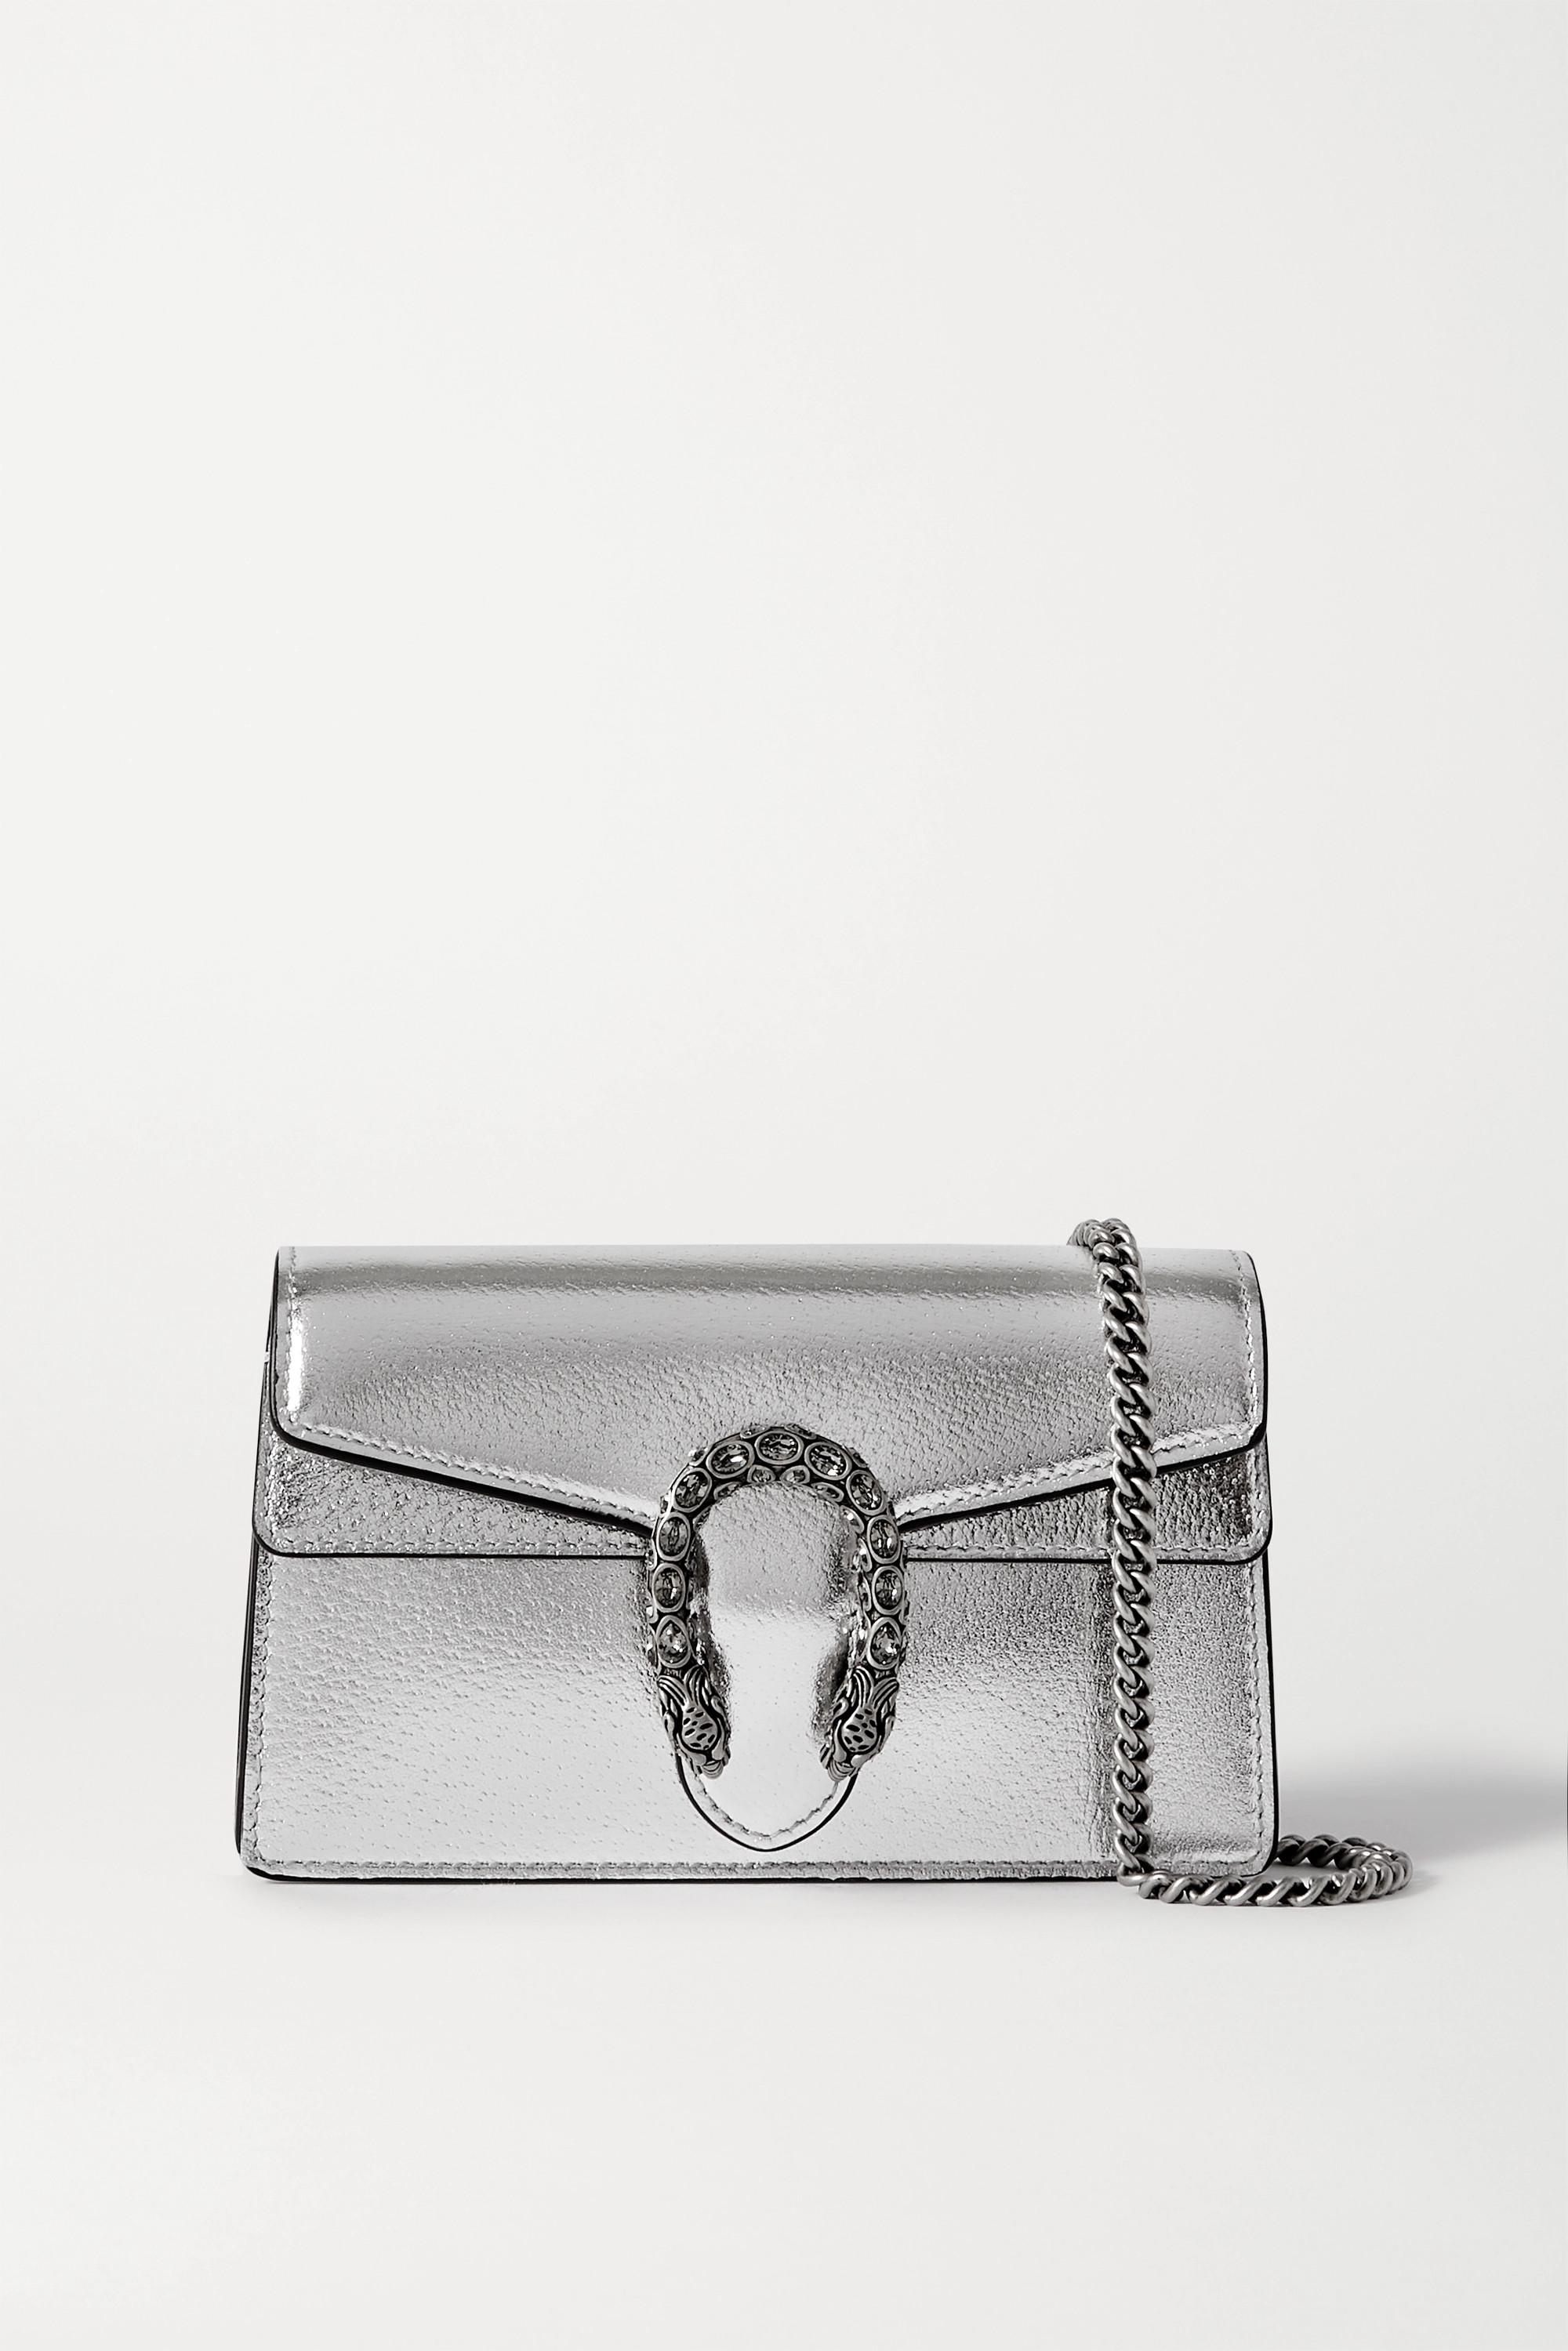 Gucci Dionysus super mini metallic leather shoulder bag